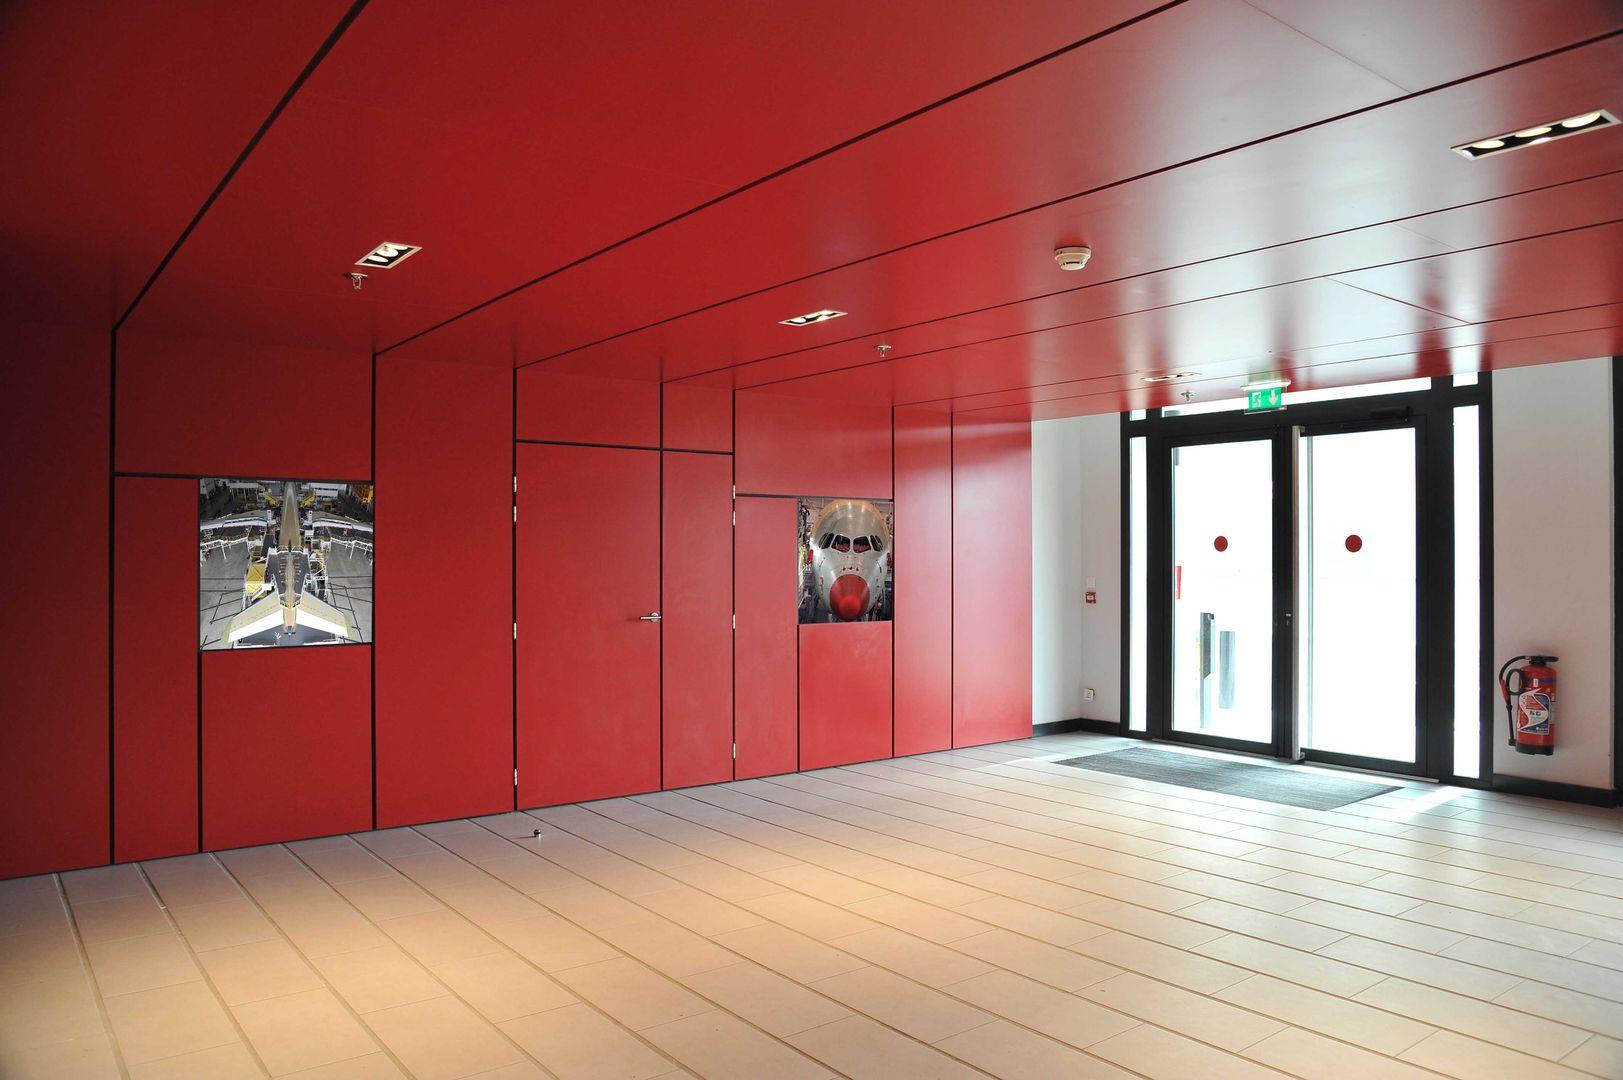 15_2014-a350-hall-avion-bureaux.jpg